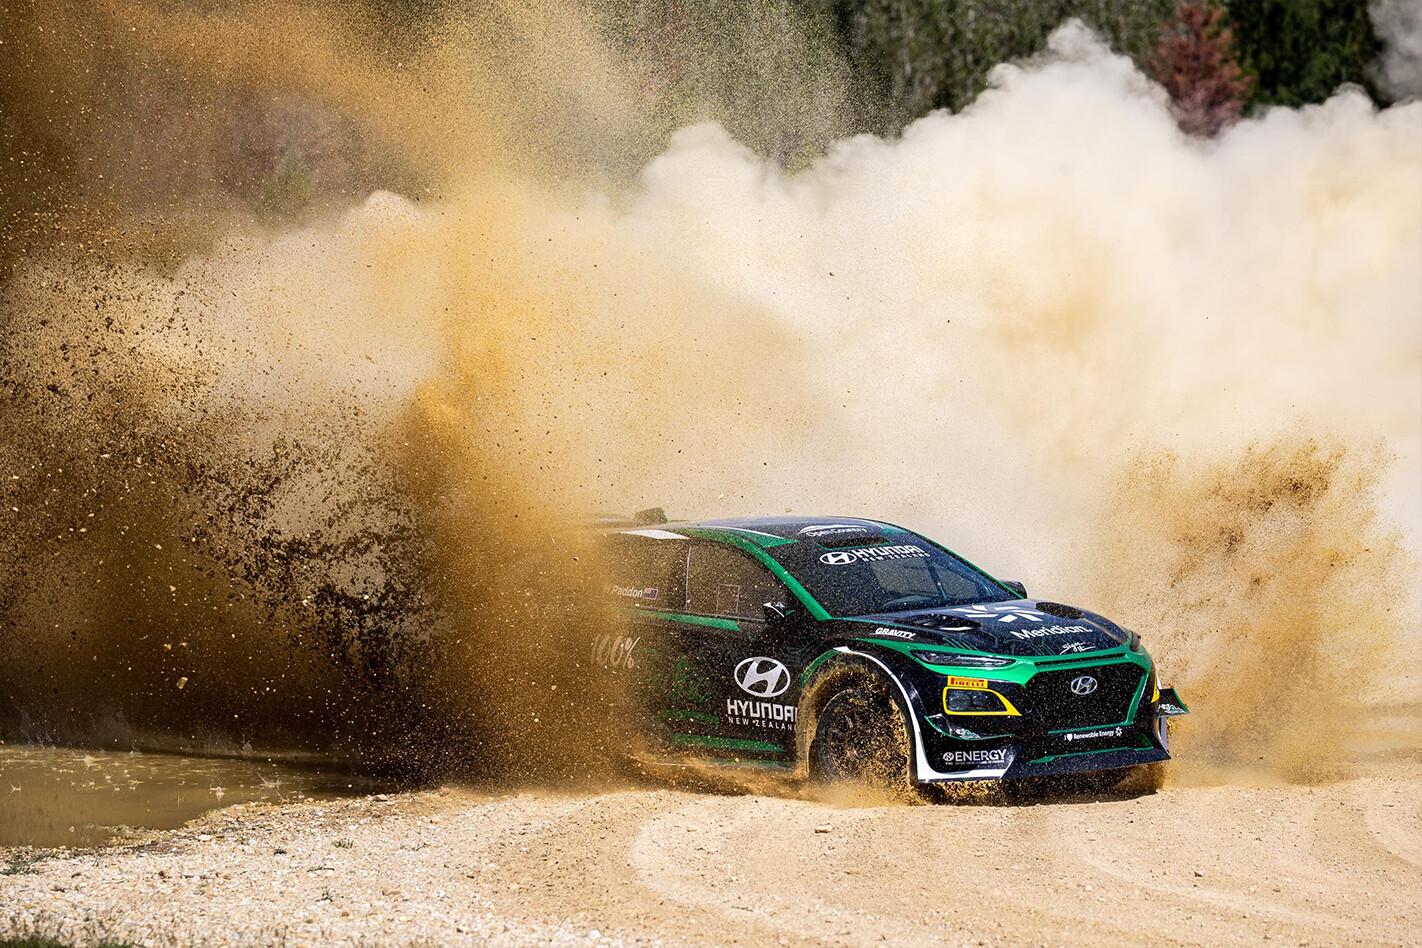 Hyundai Kona EV rally car dirt corner